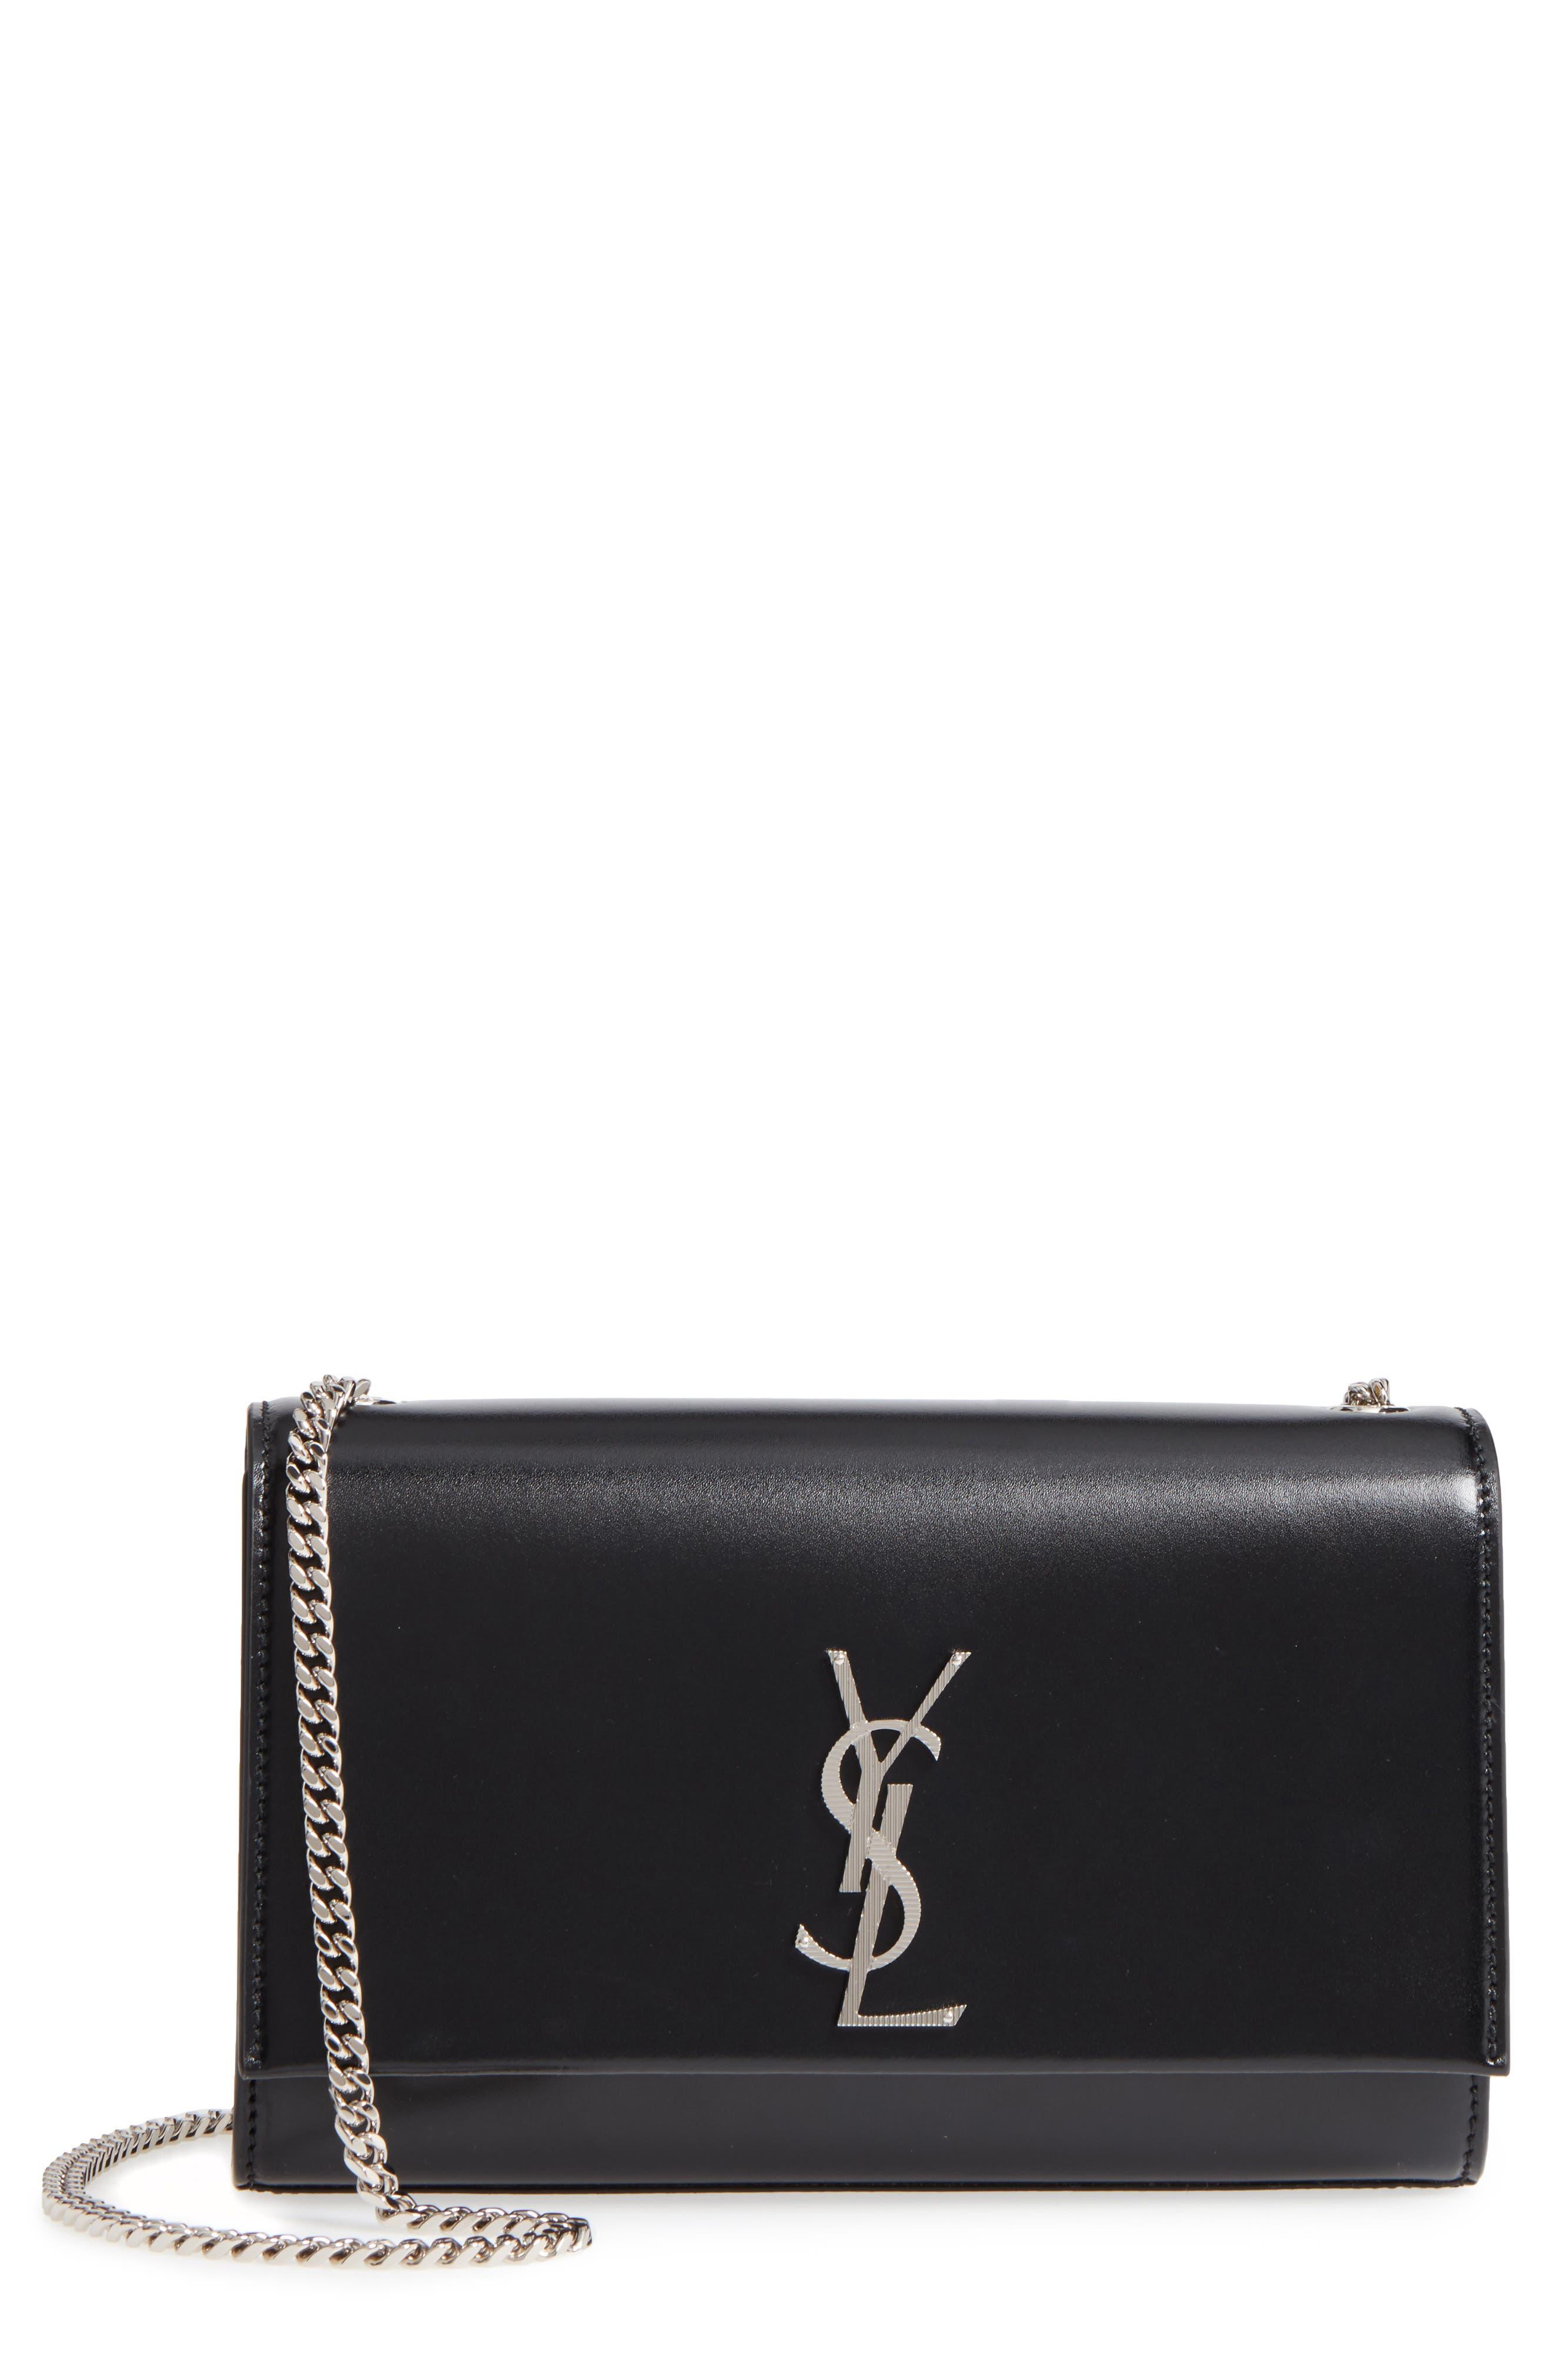 Medium Kate Calfskin Leather Crossbody Bag,                         Main,                         color, Noir